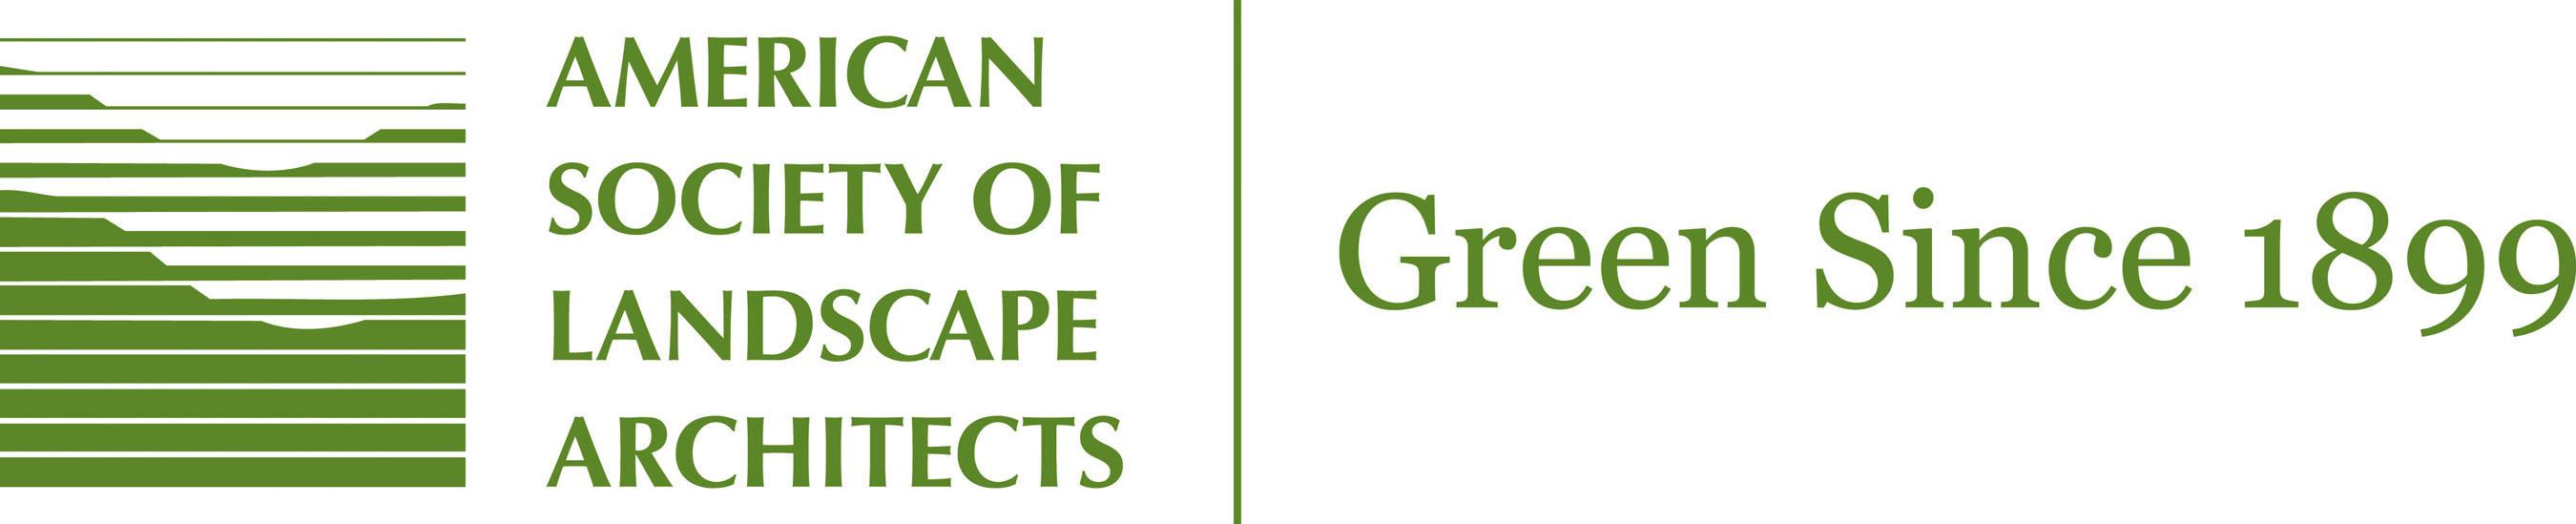 American Society of Landscape Architects logo.